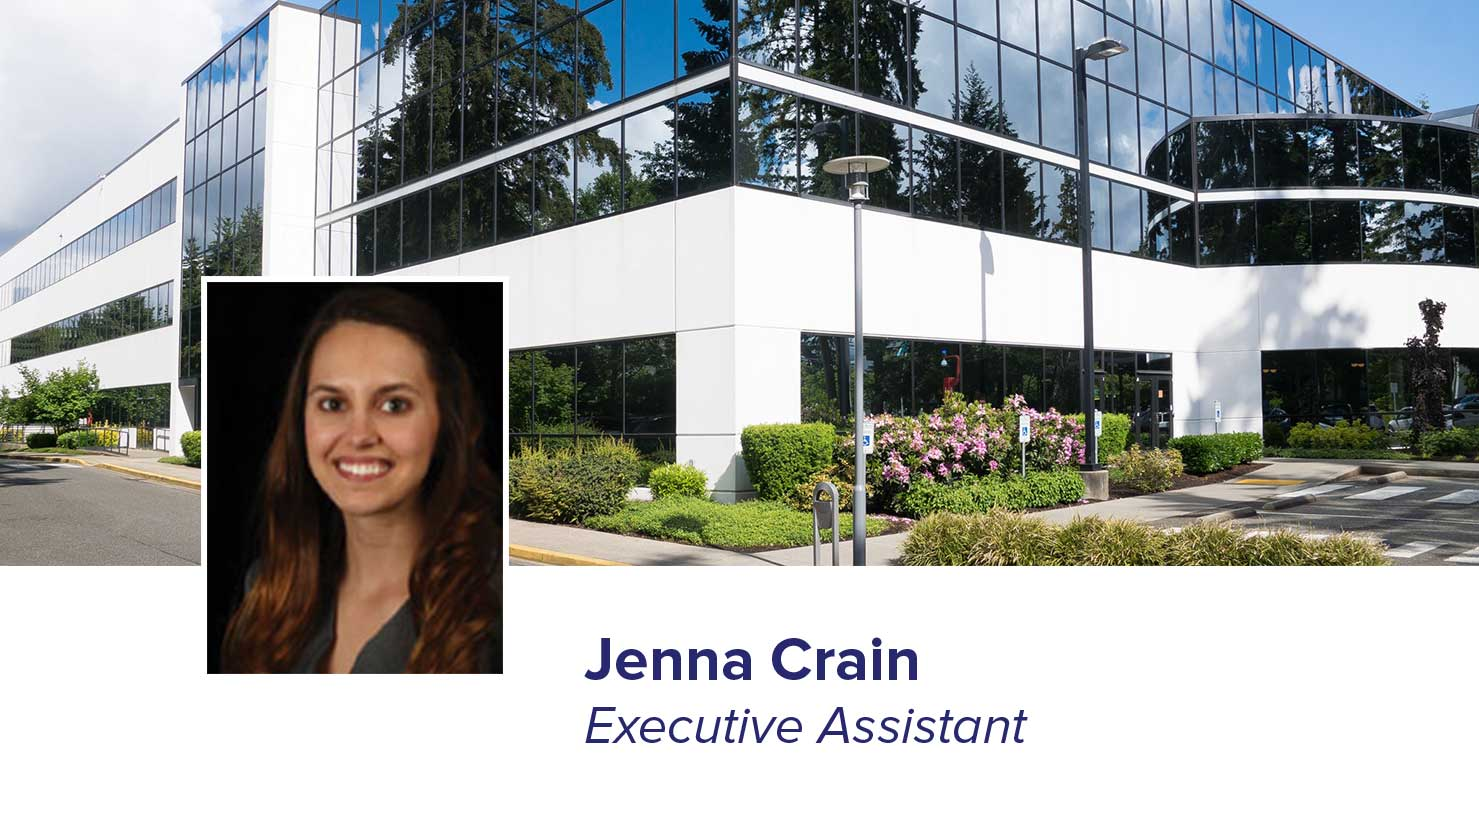 Jenna Crain